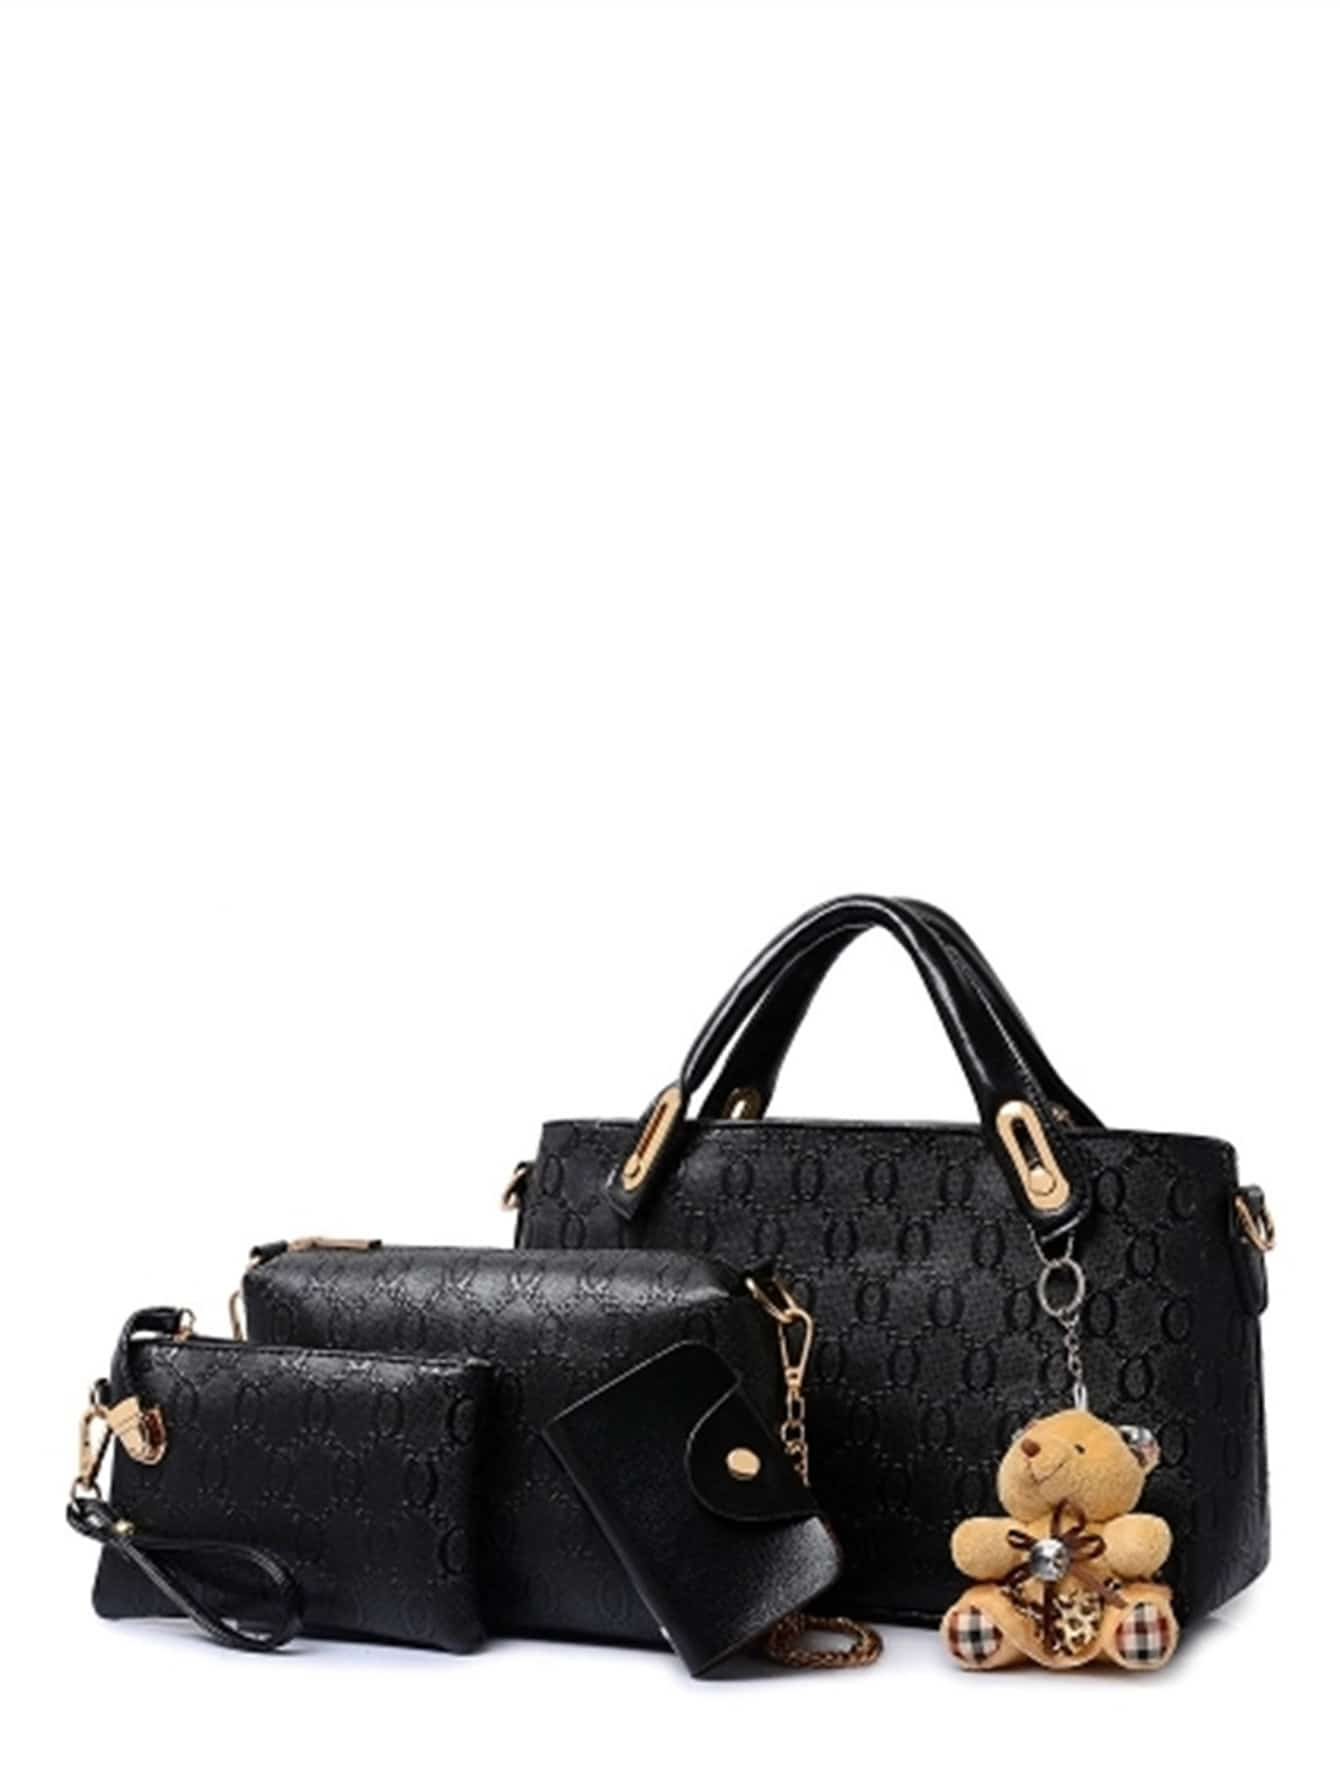 PU Combination Bag 4pcs With Bear Detail